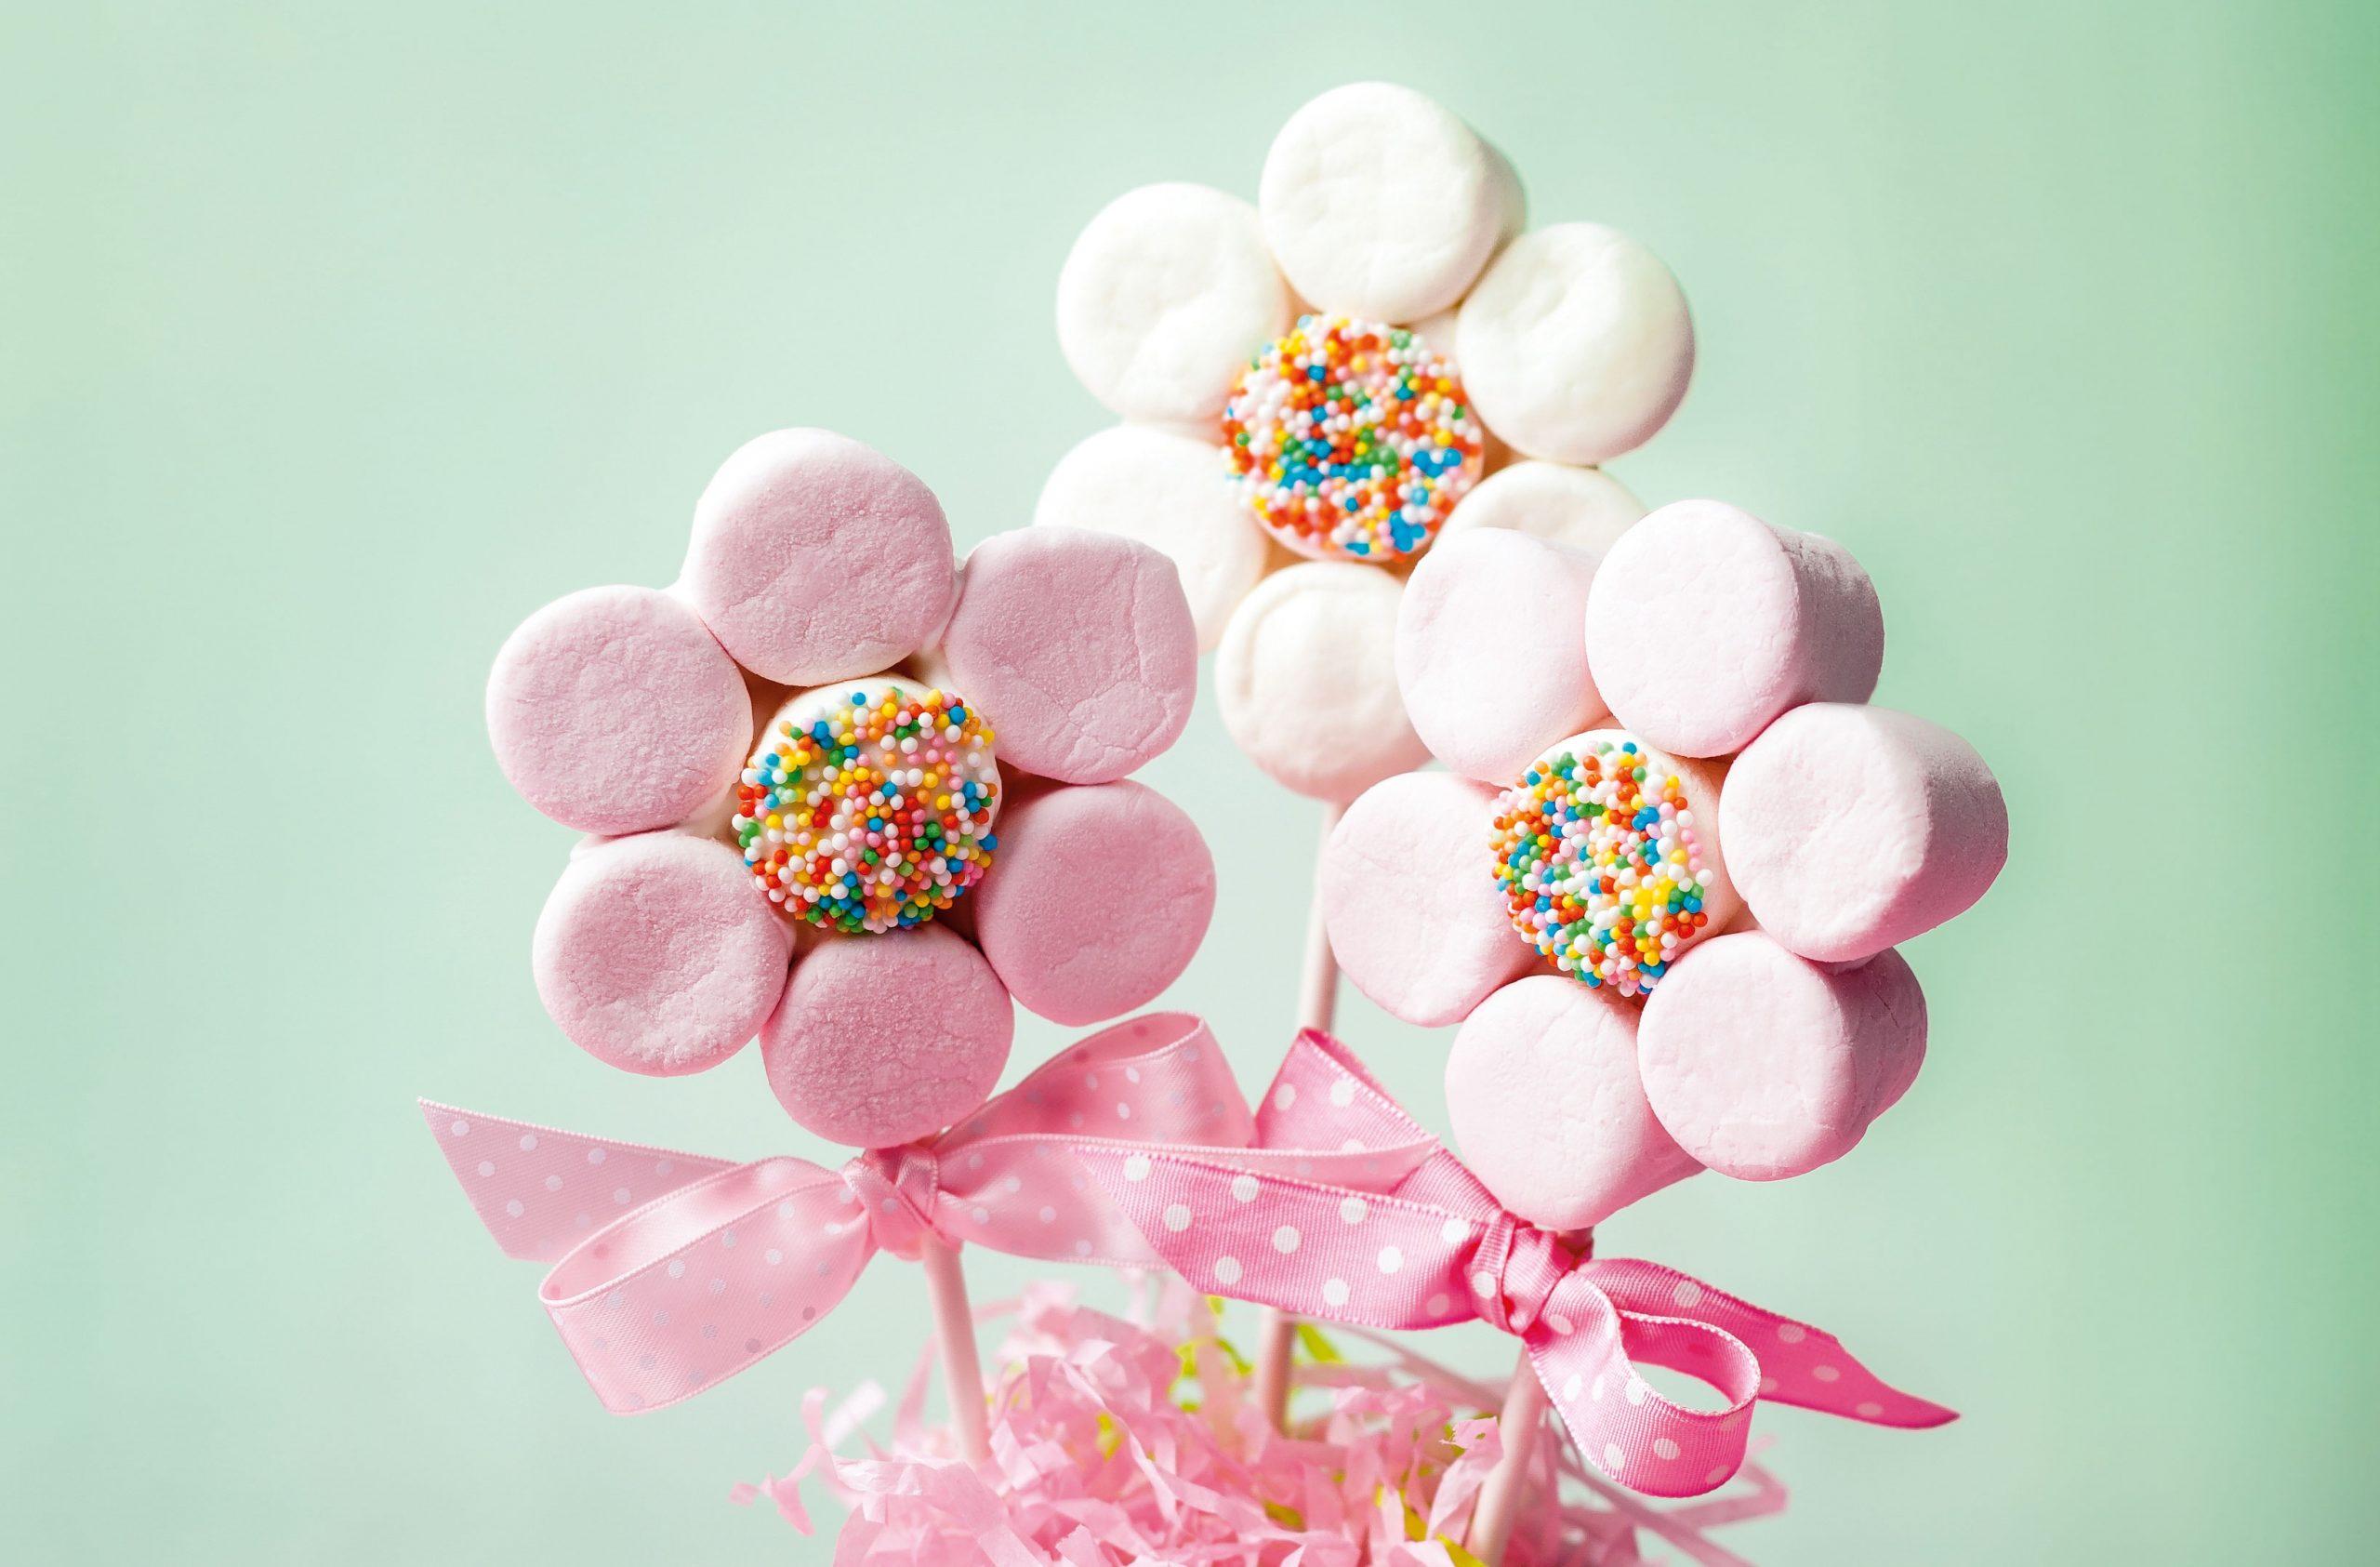 Marshmallow flowers